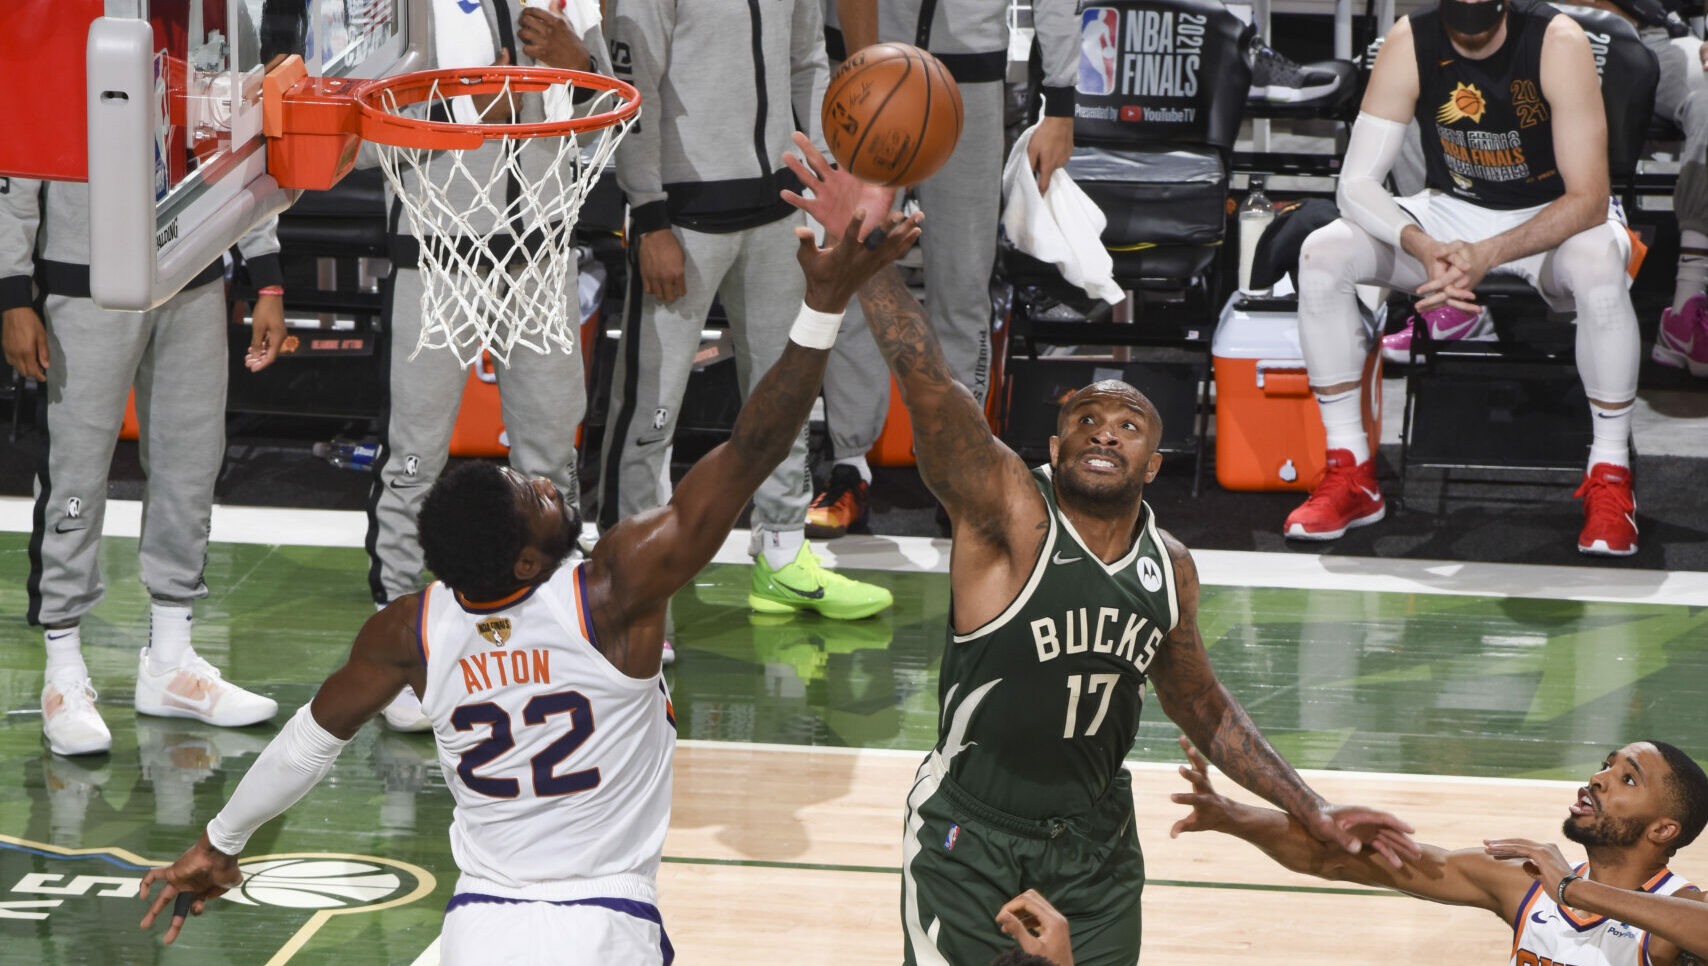 Deandre Ayton's foul trouble limits Suns in Game 3 loss vs Bucks